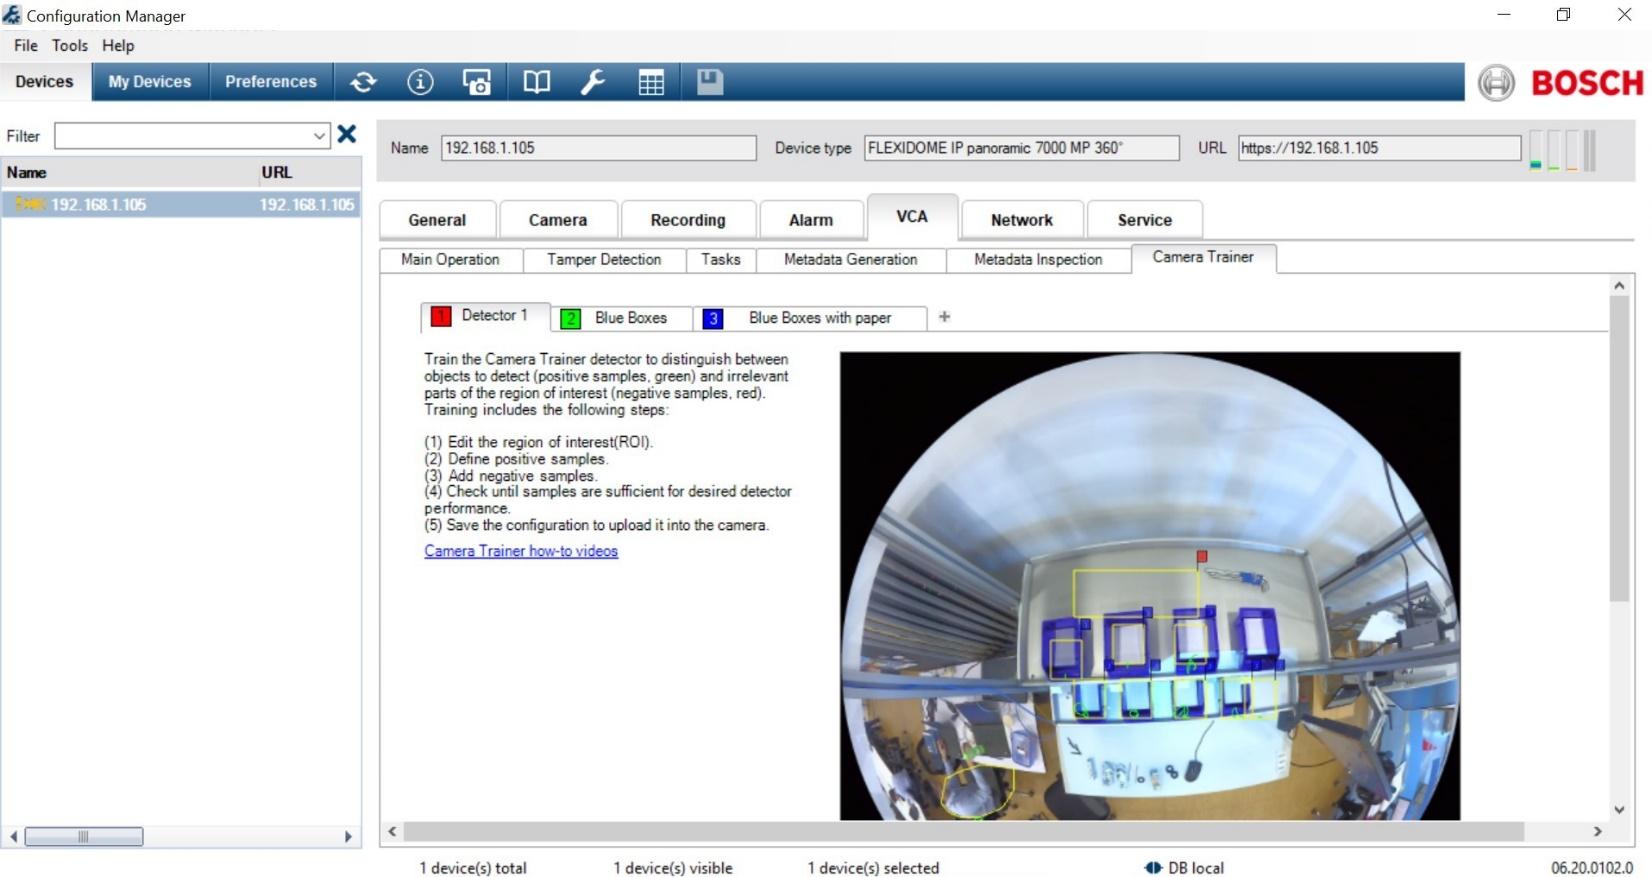 Bosch Camera Trainer 14